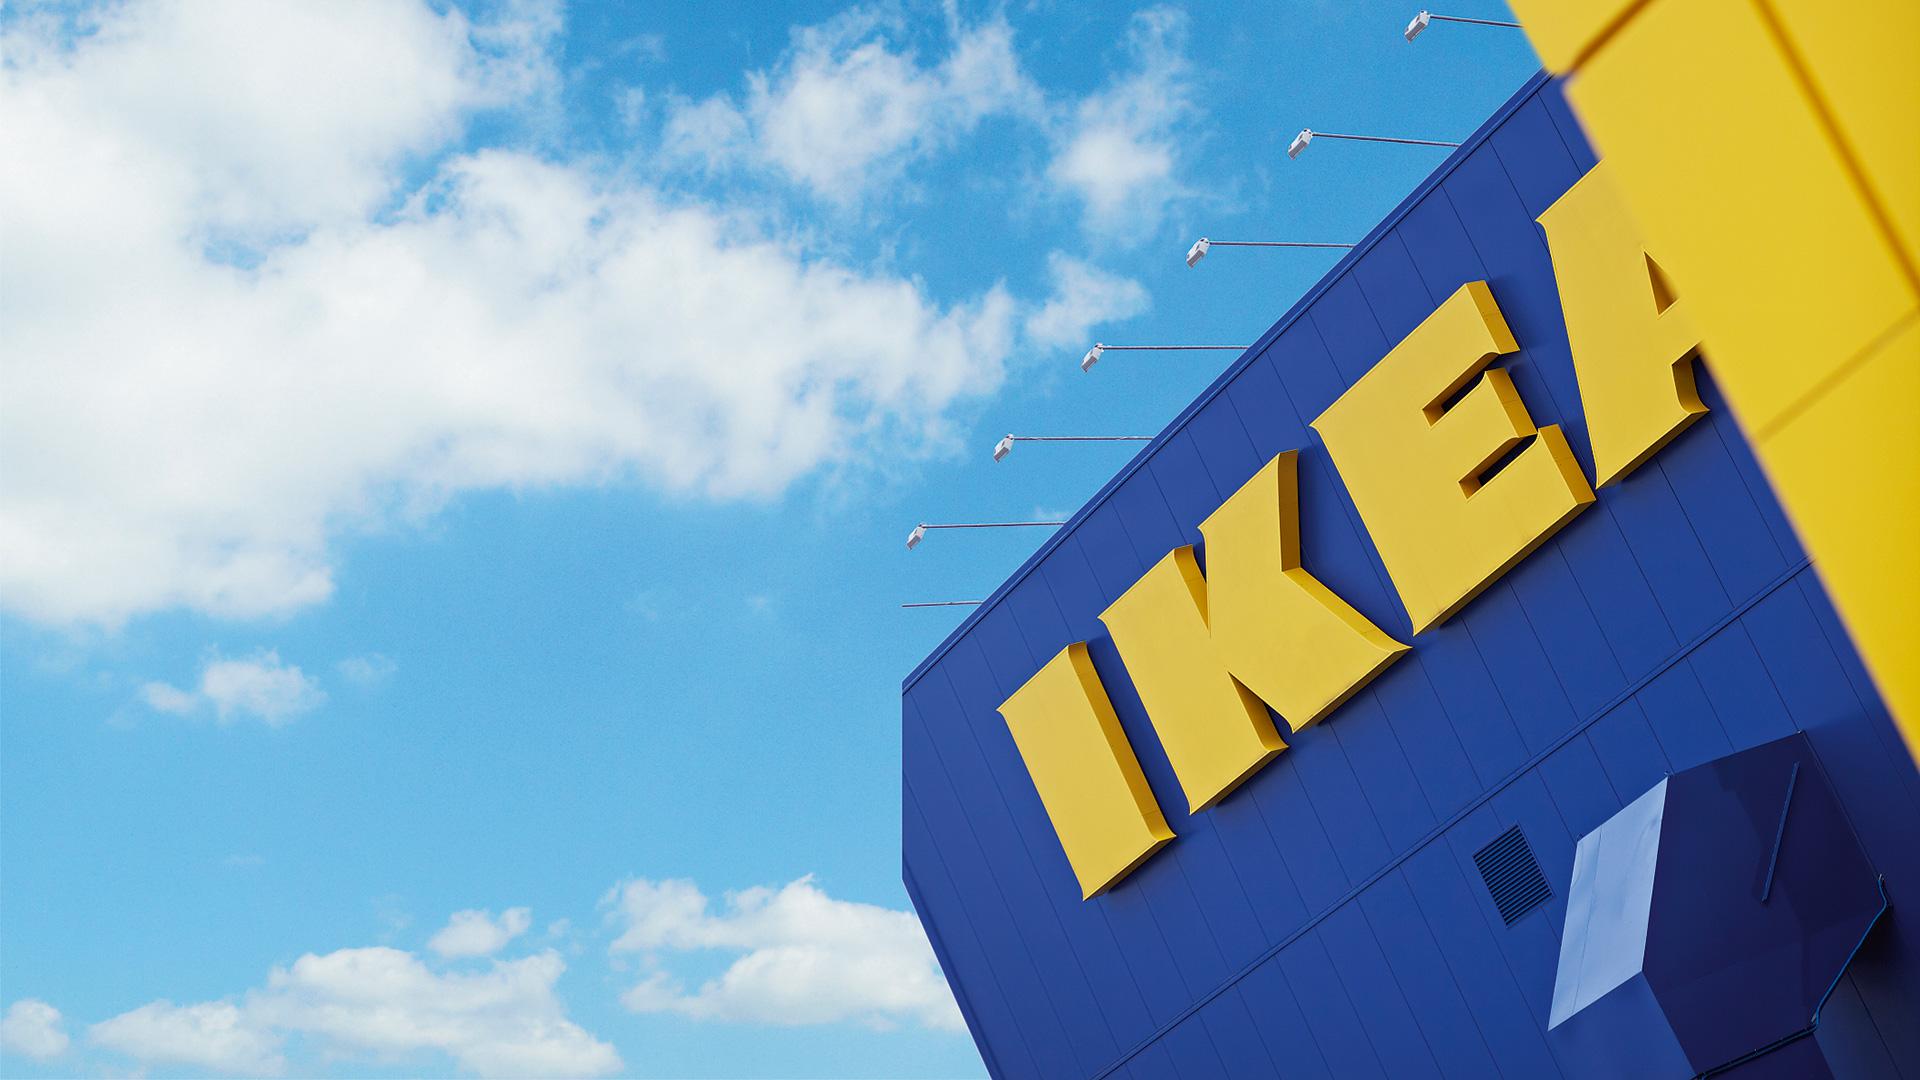 ikea begins a review of its global media business u2013 adweek